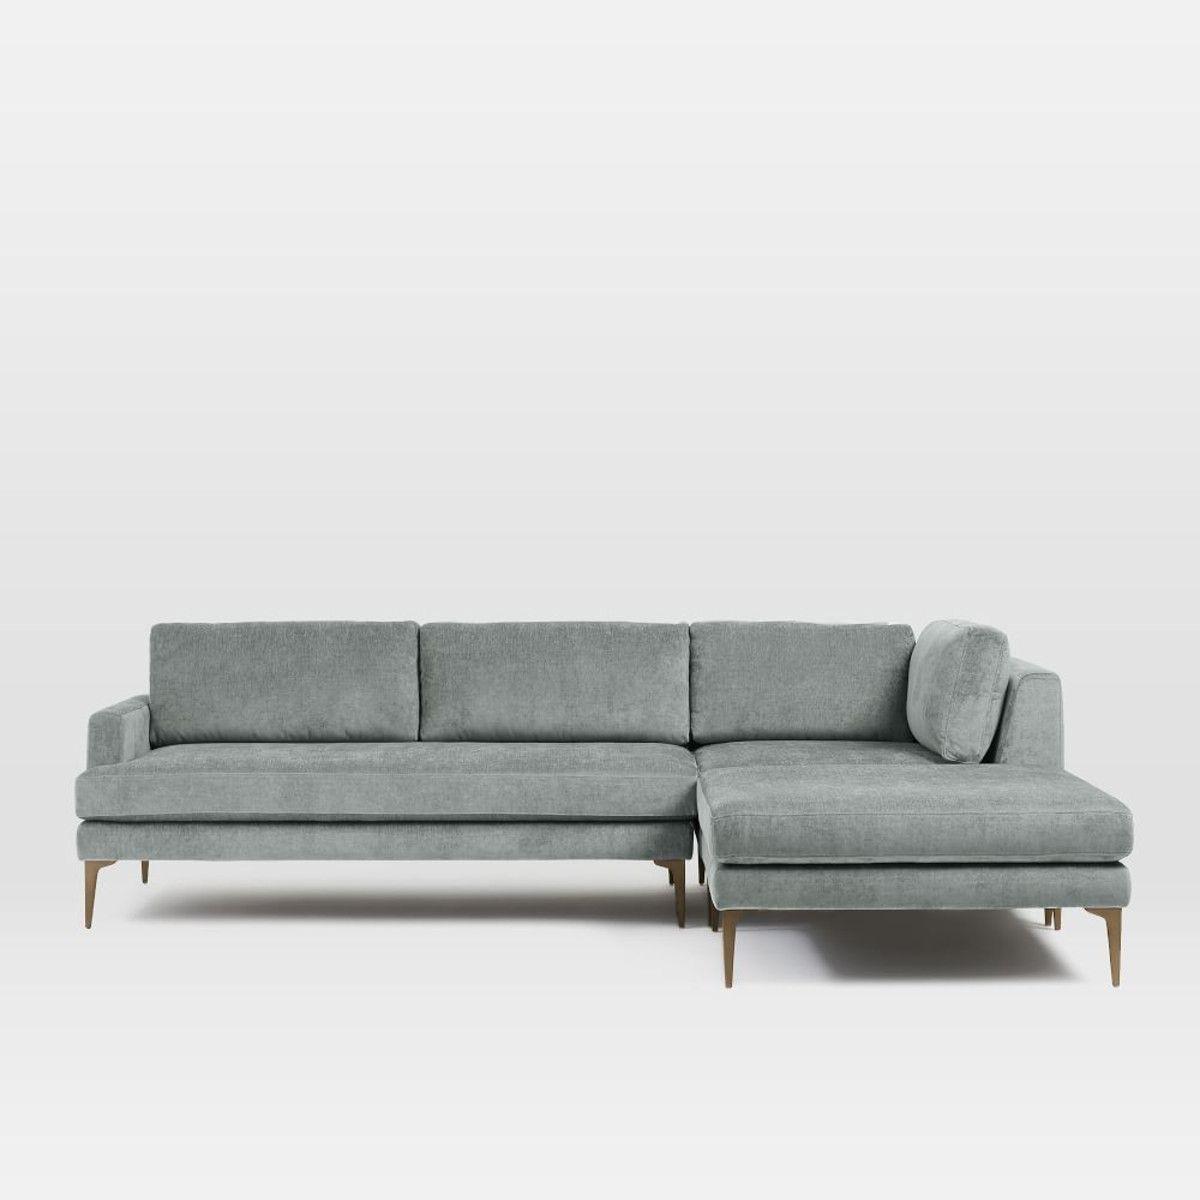 Chaise Sectional Modular Sofa